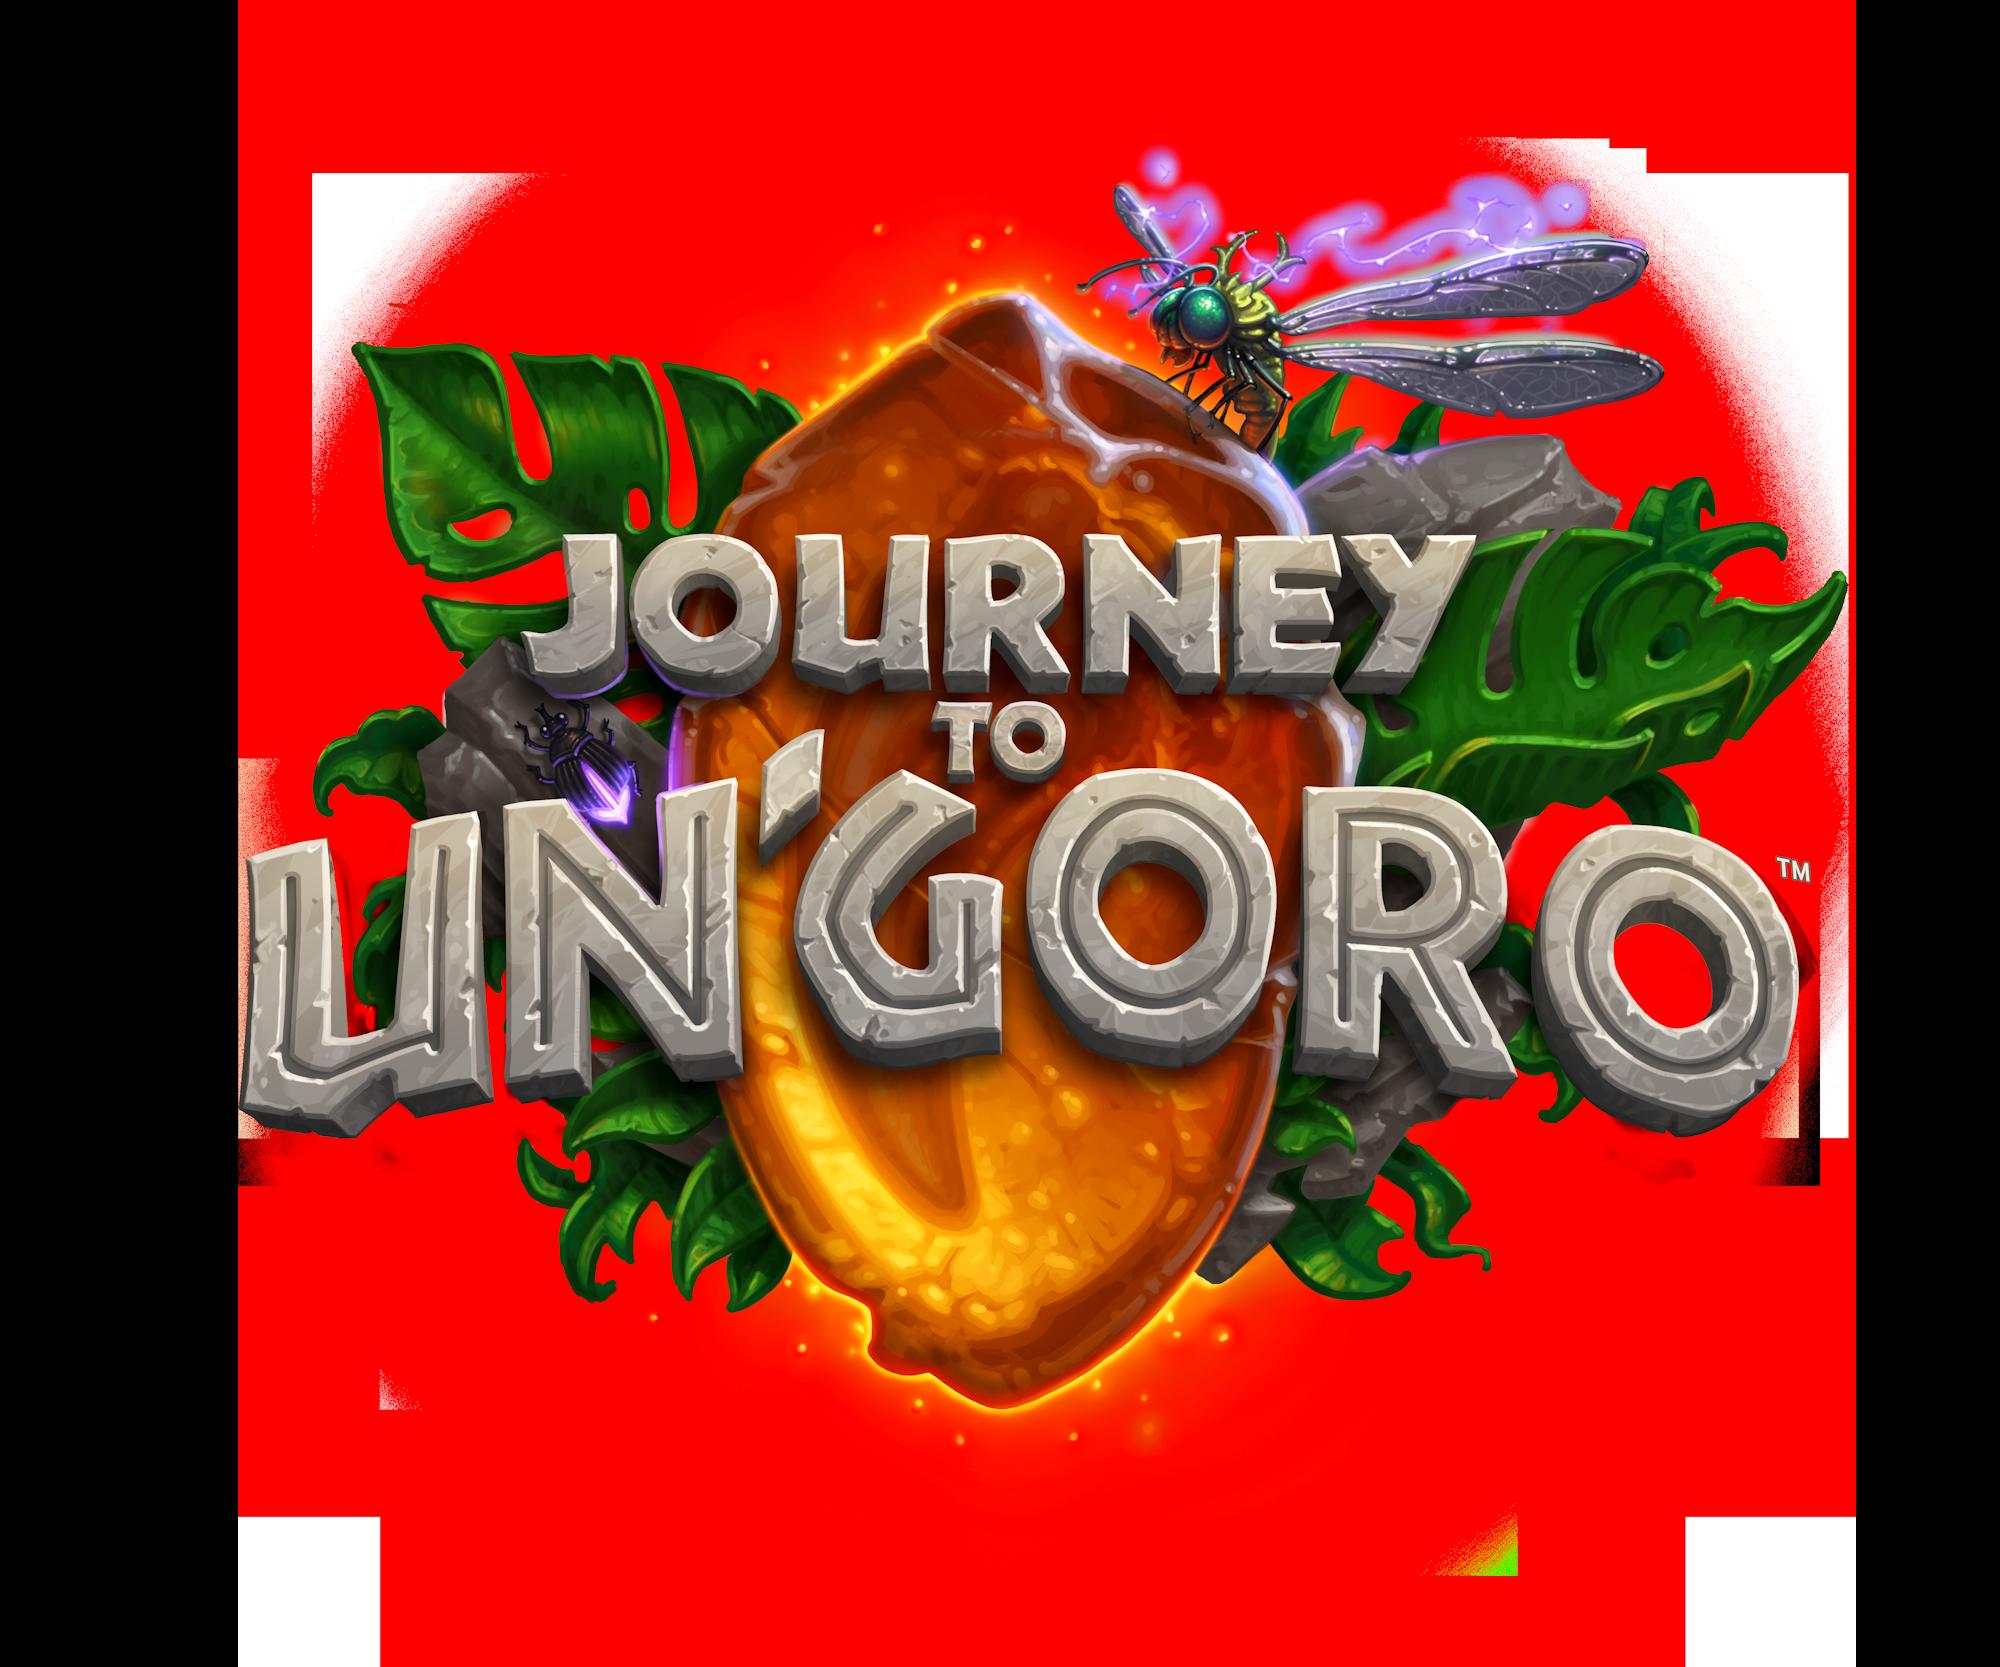 Journey To Ungoro Hearthstone Heroes Of Warcraft Wiki Fandom